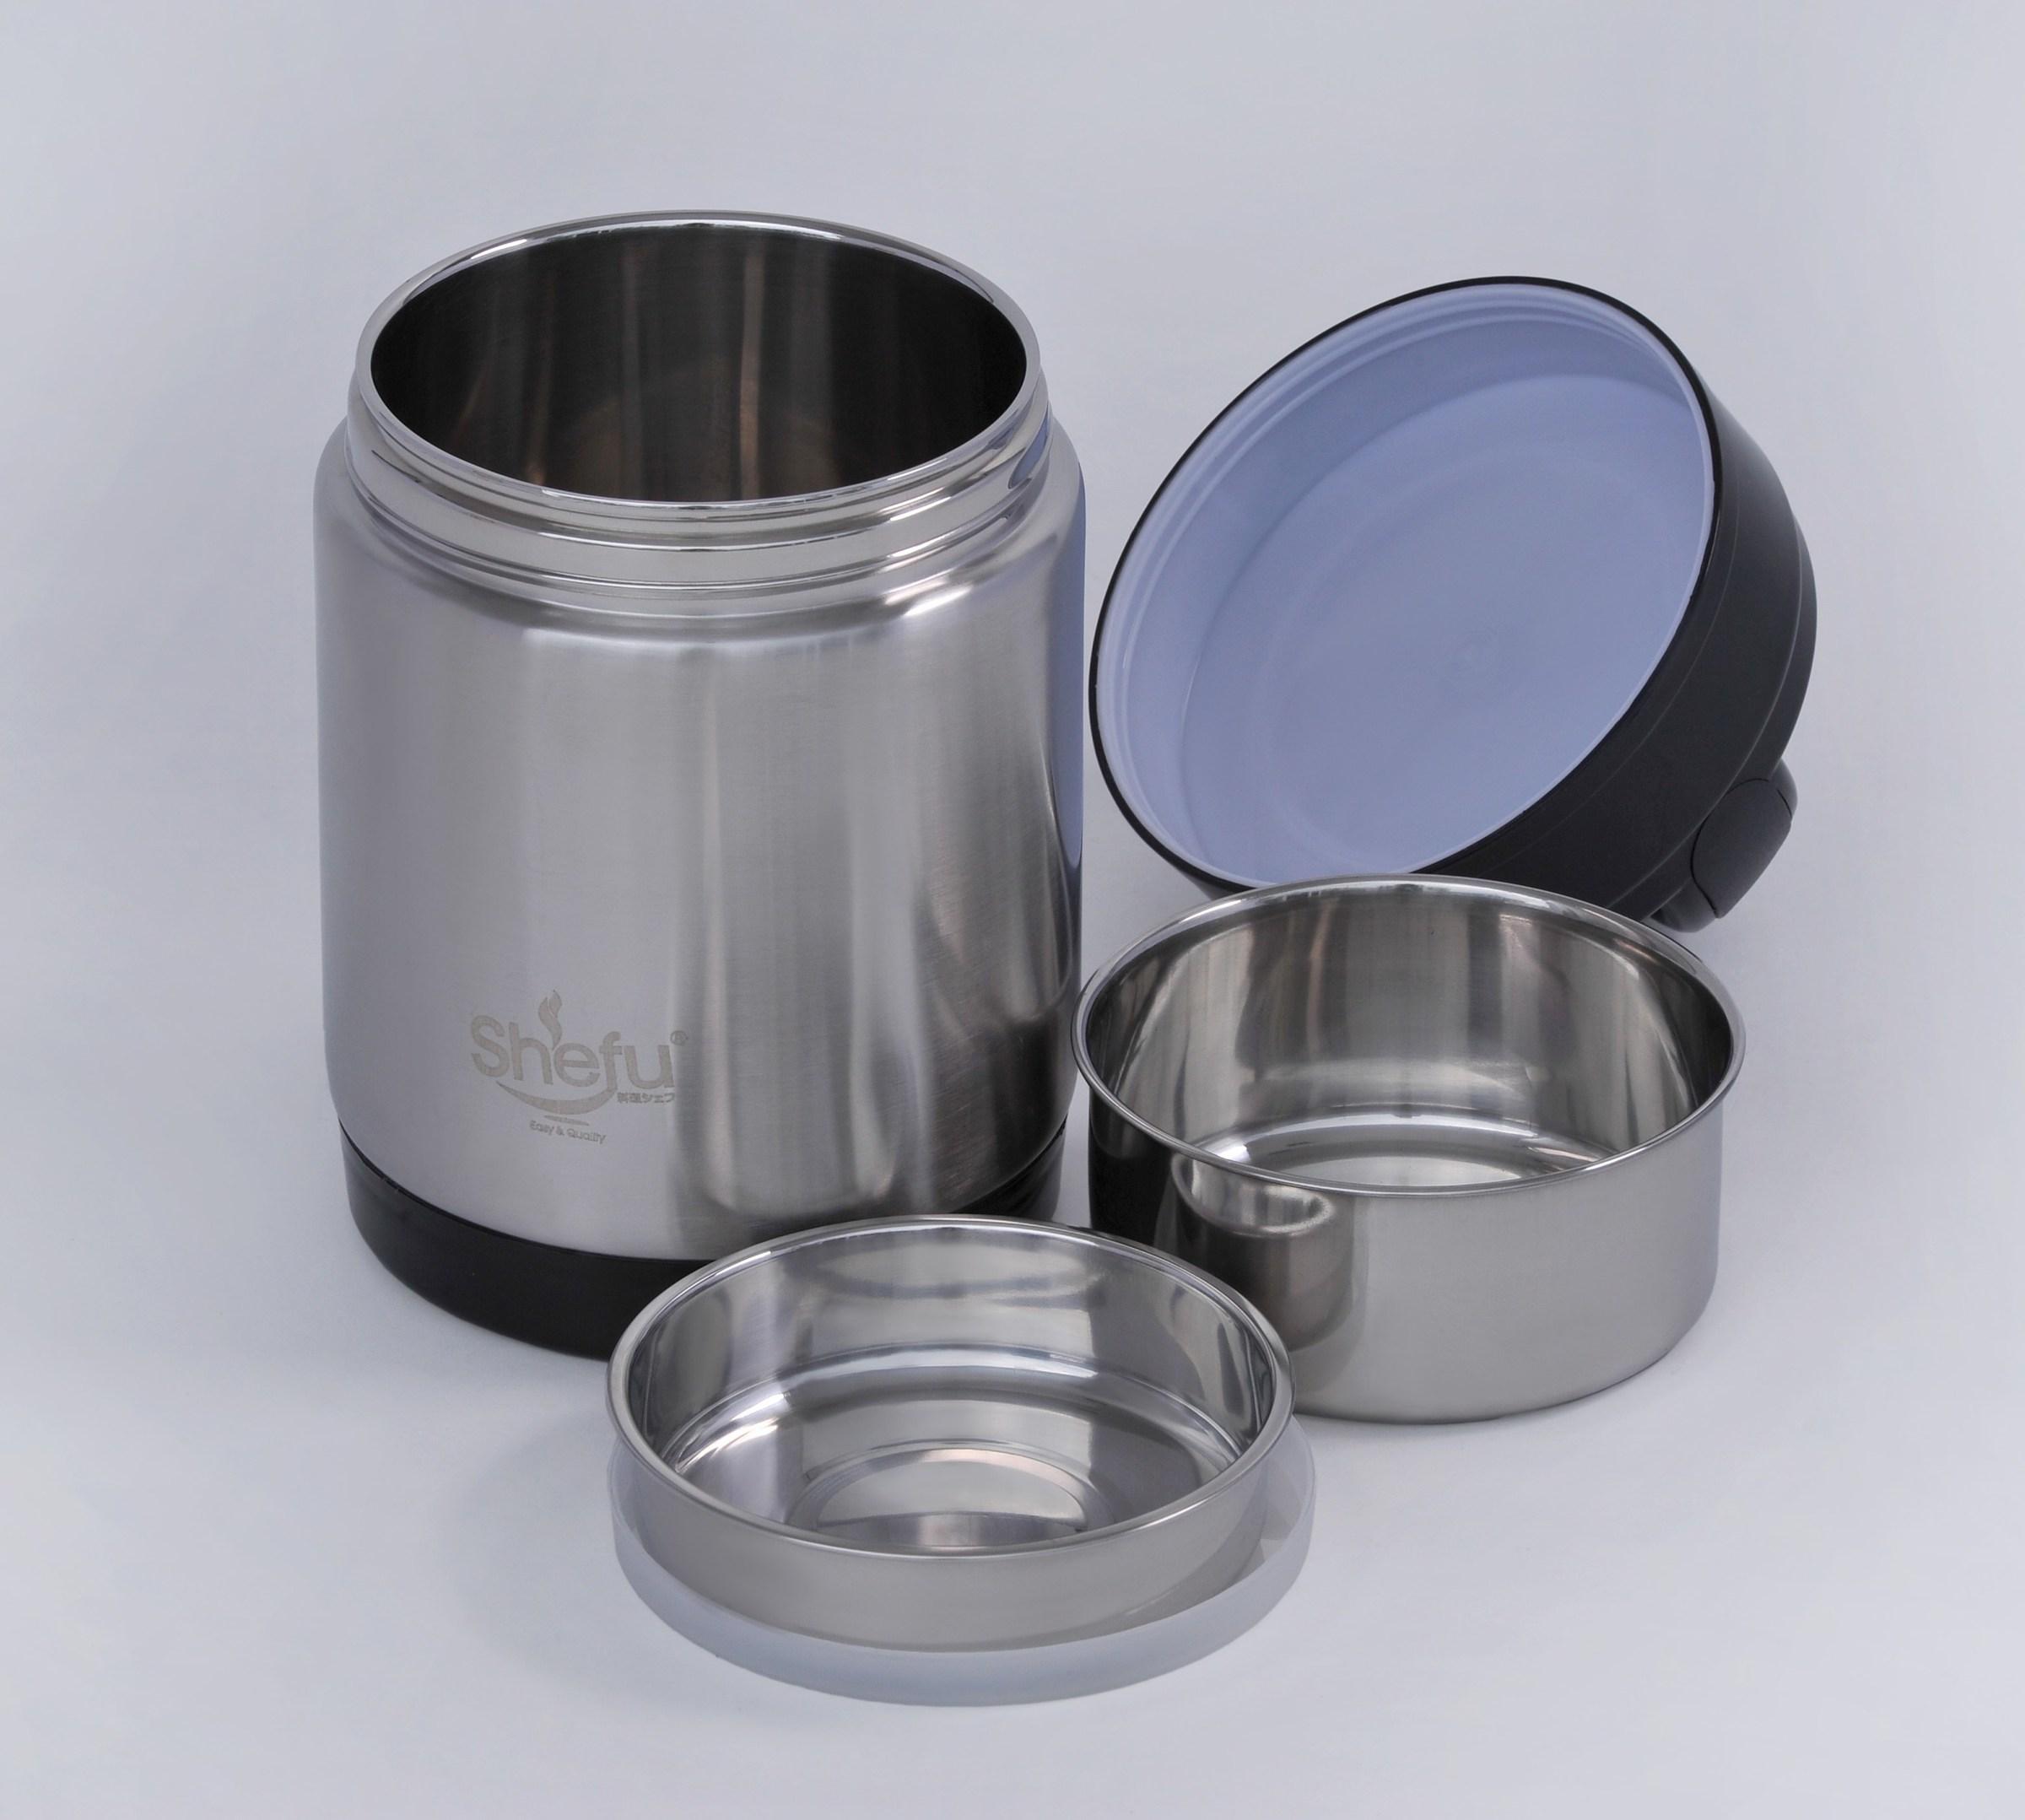 icookasia shefu food container.jpg